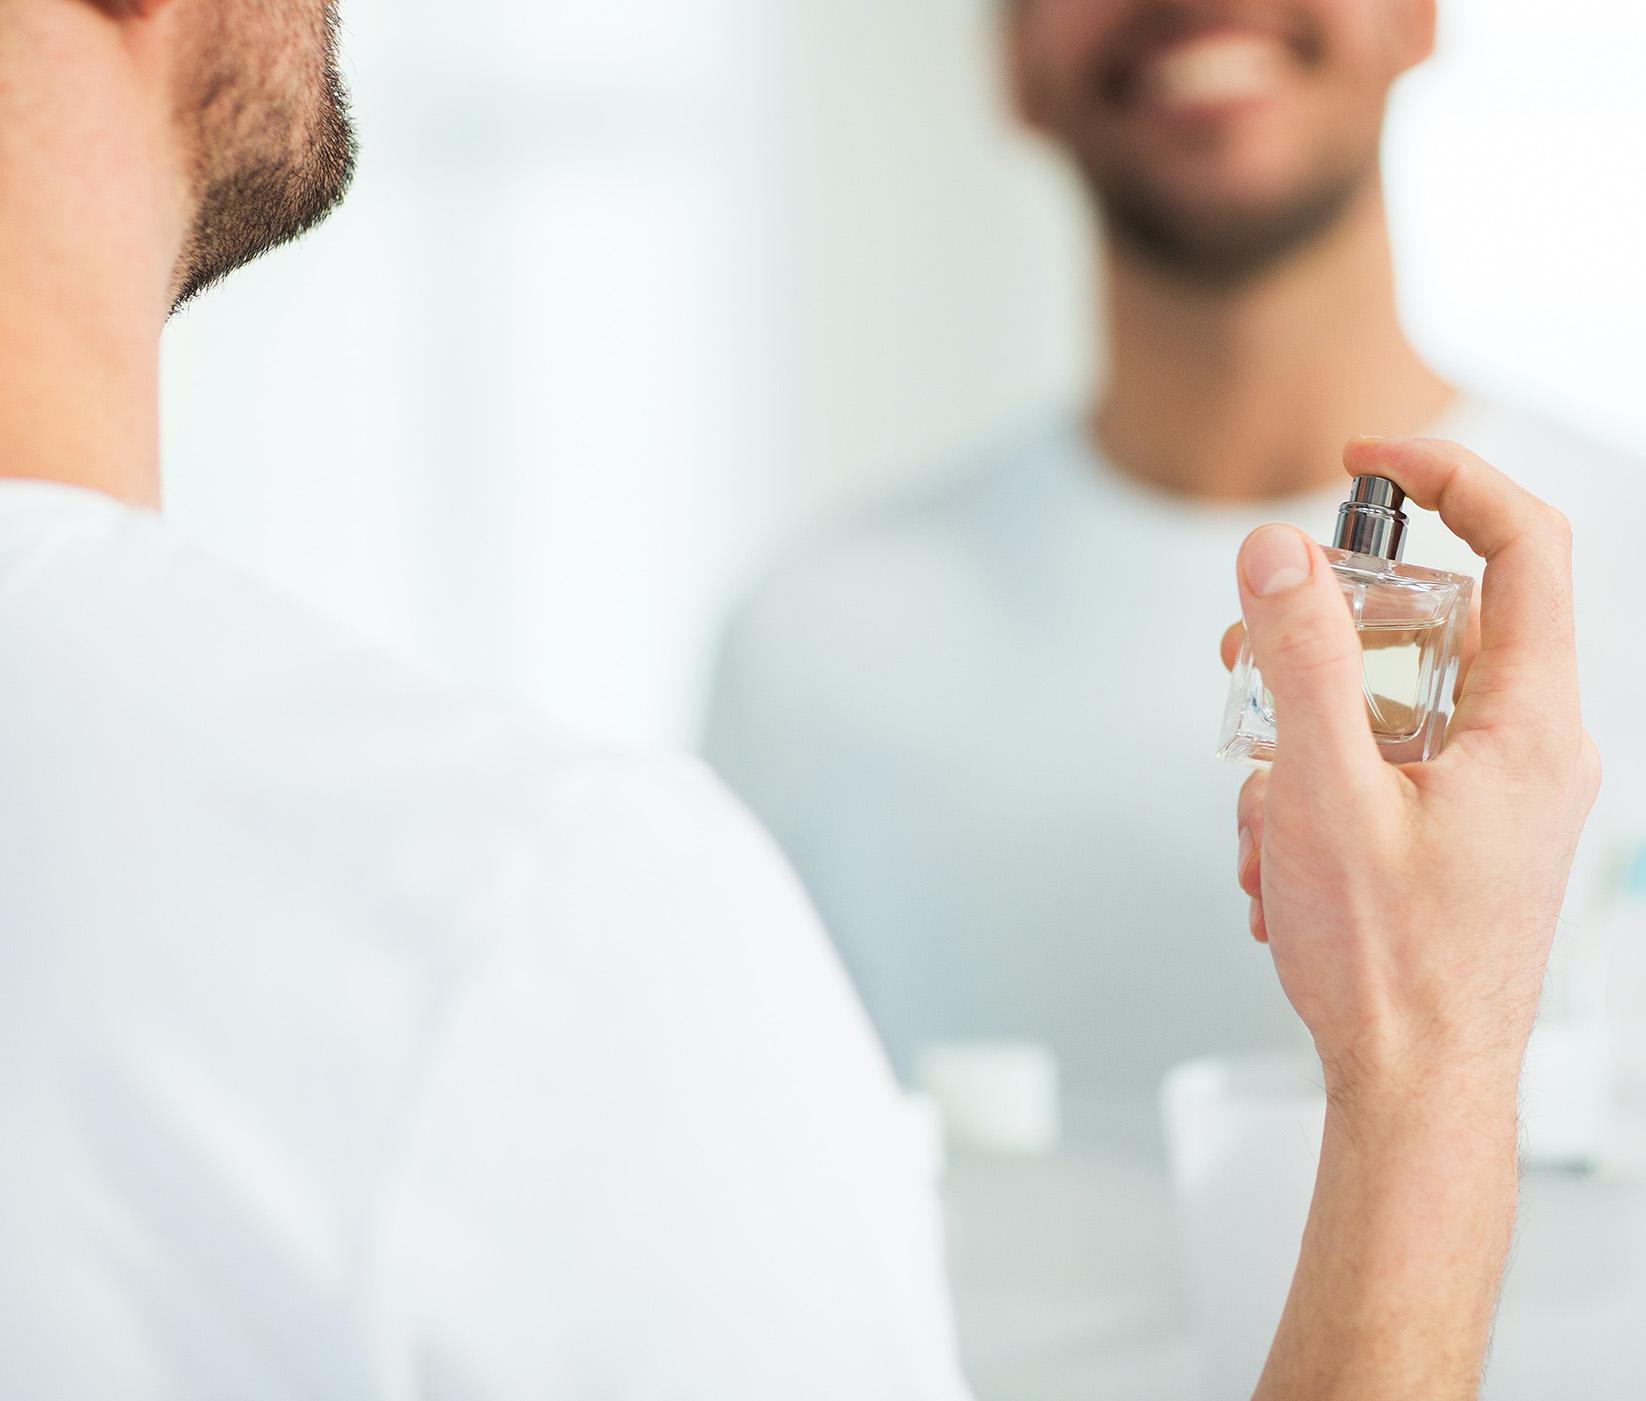 parfums plus close up of man perfuming with perfume at bathroom